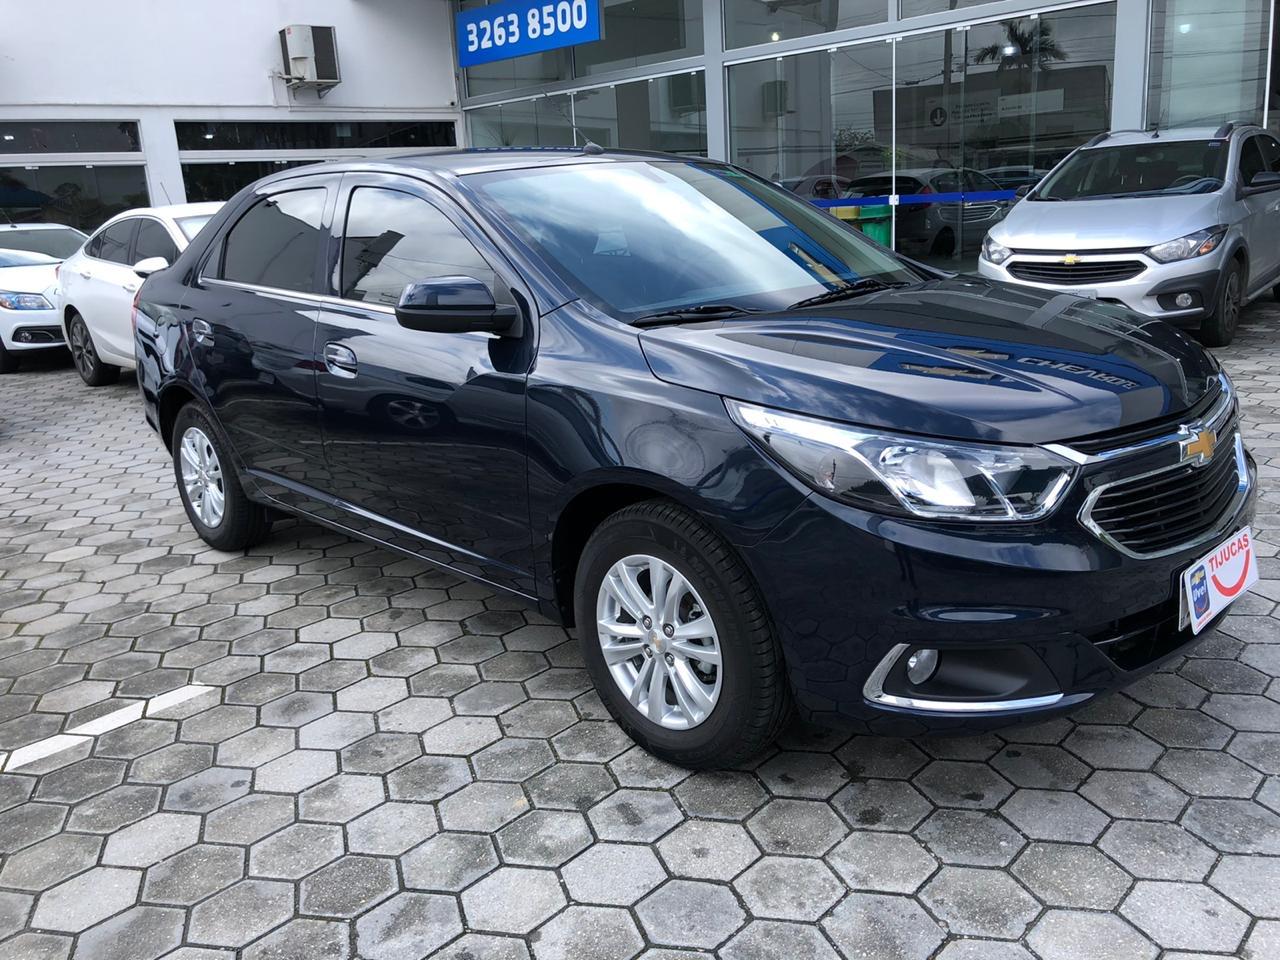 Chevrolet Cobalt LTZ 1.8L 2019